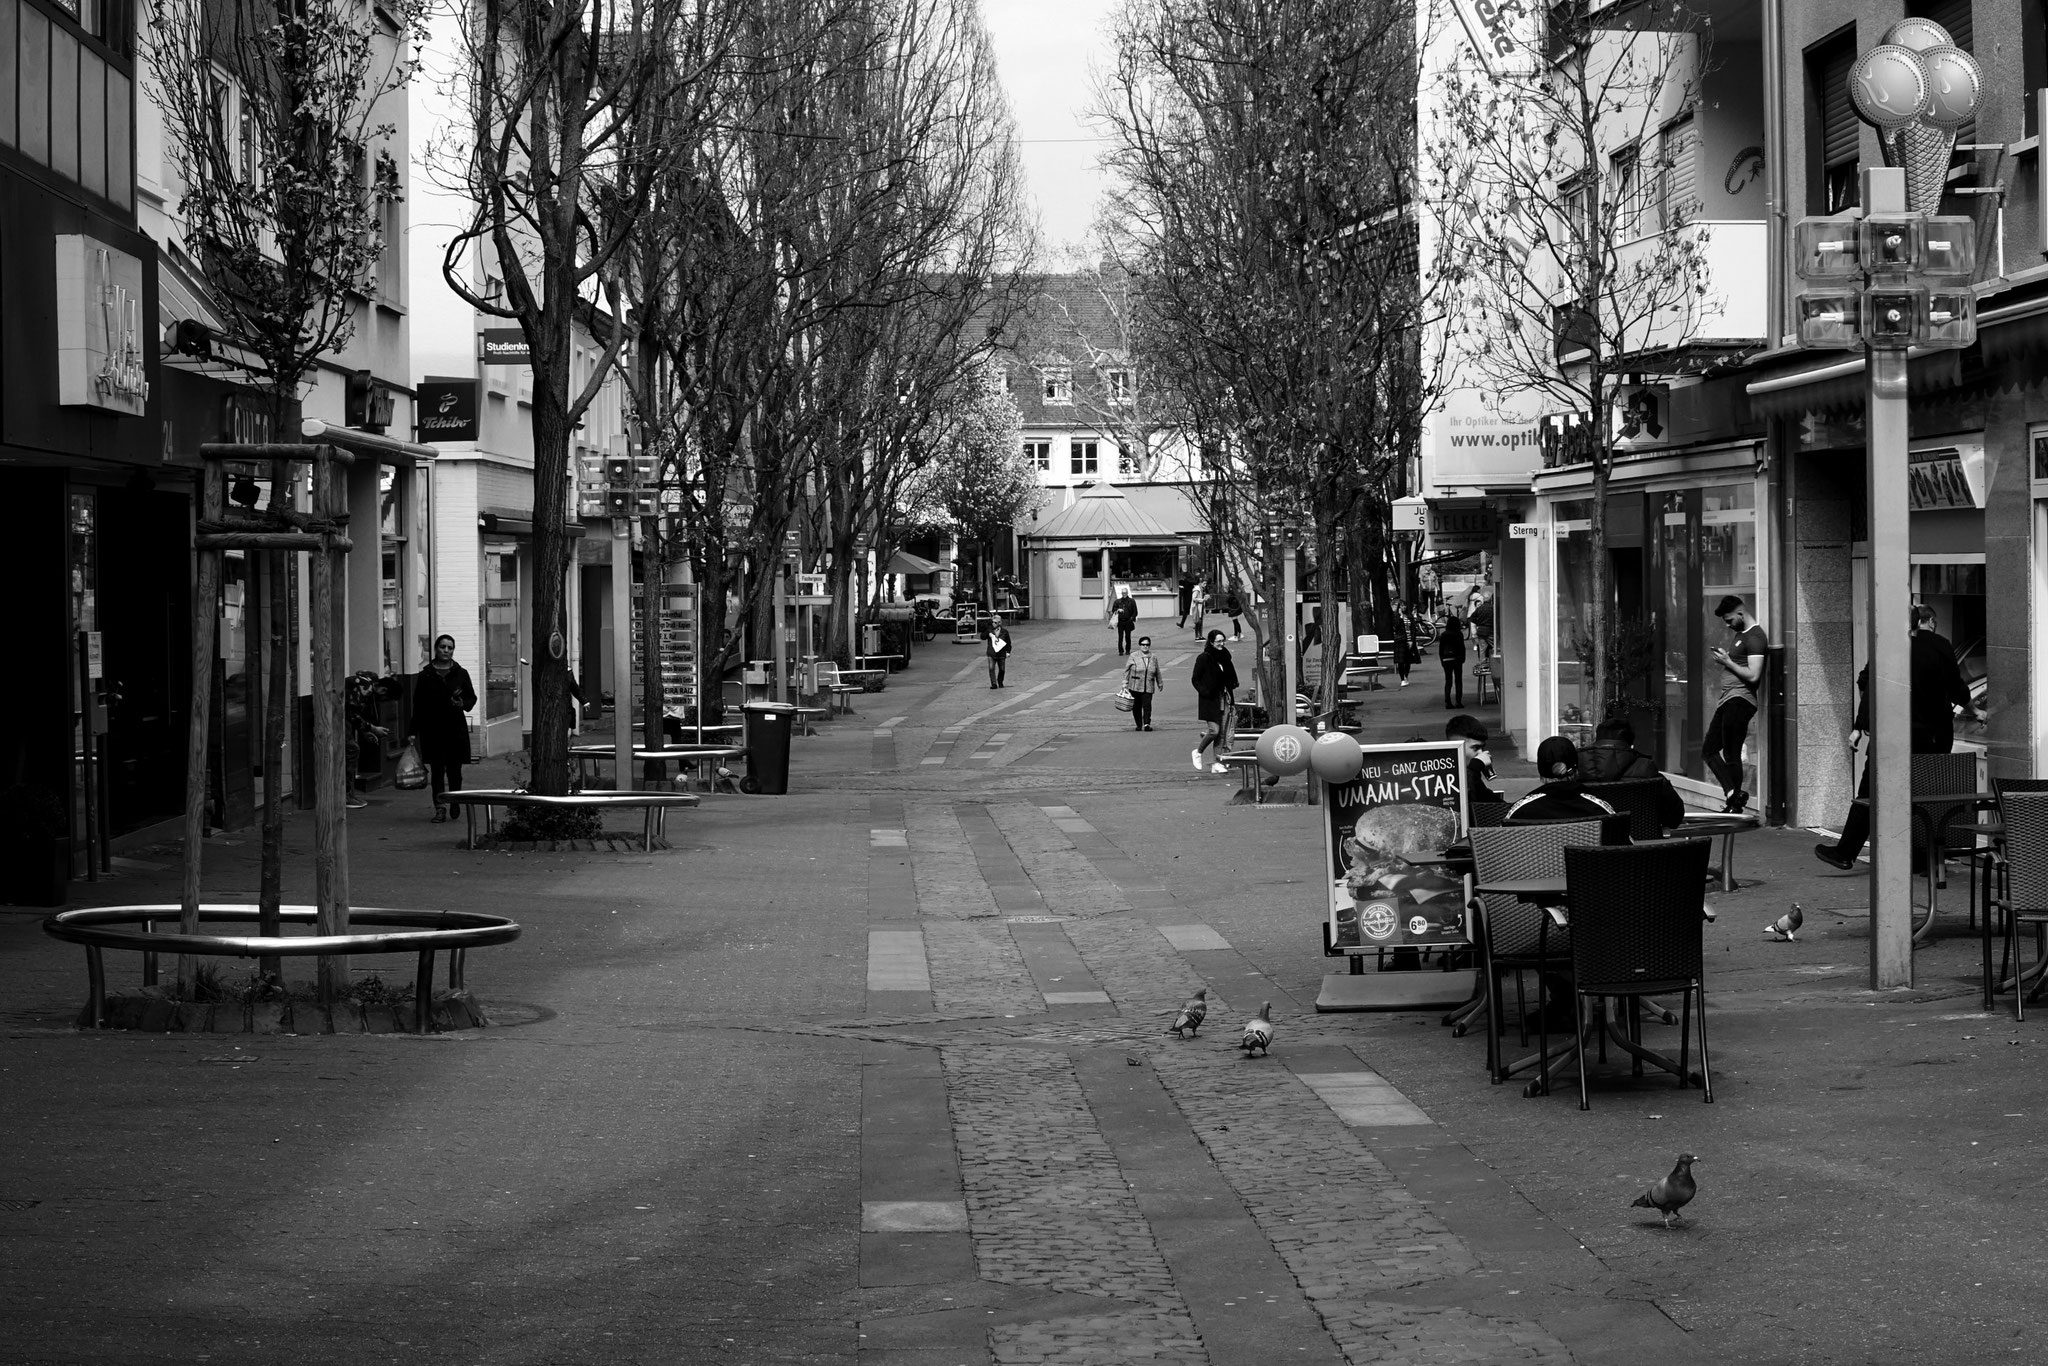 18.3.2020 | FT | Speyerer Straße | leere Fußgängerzone (13.10 Uhr)